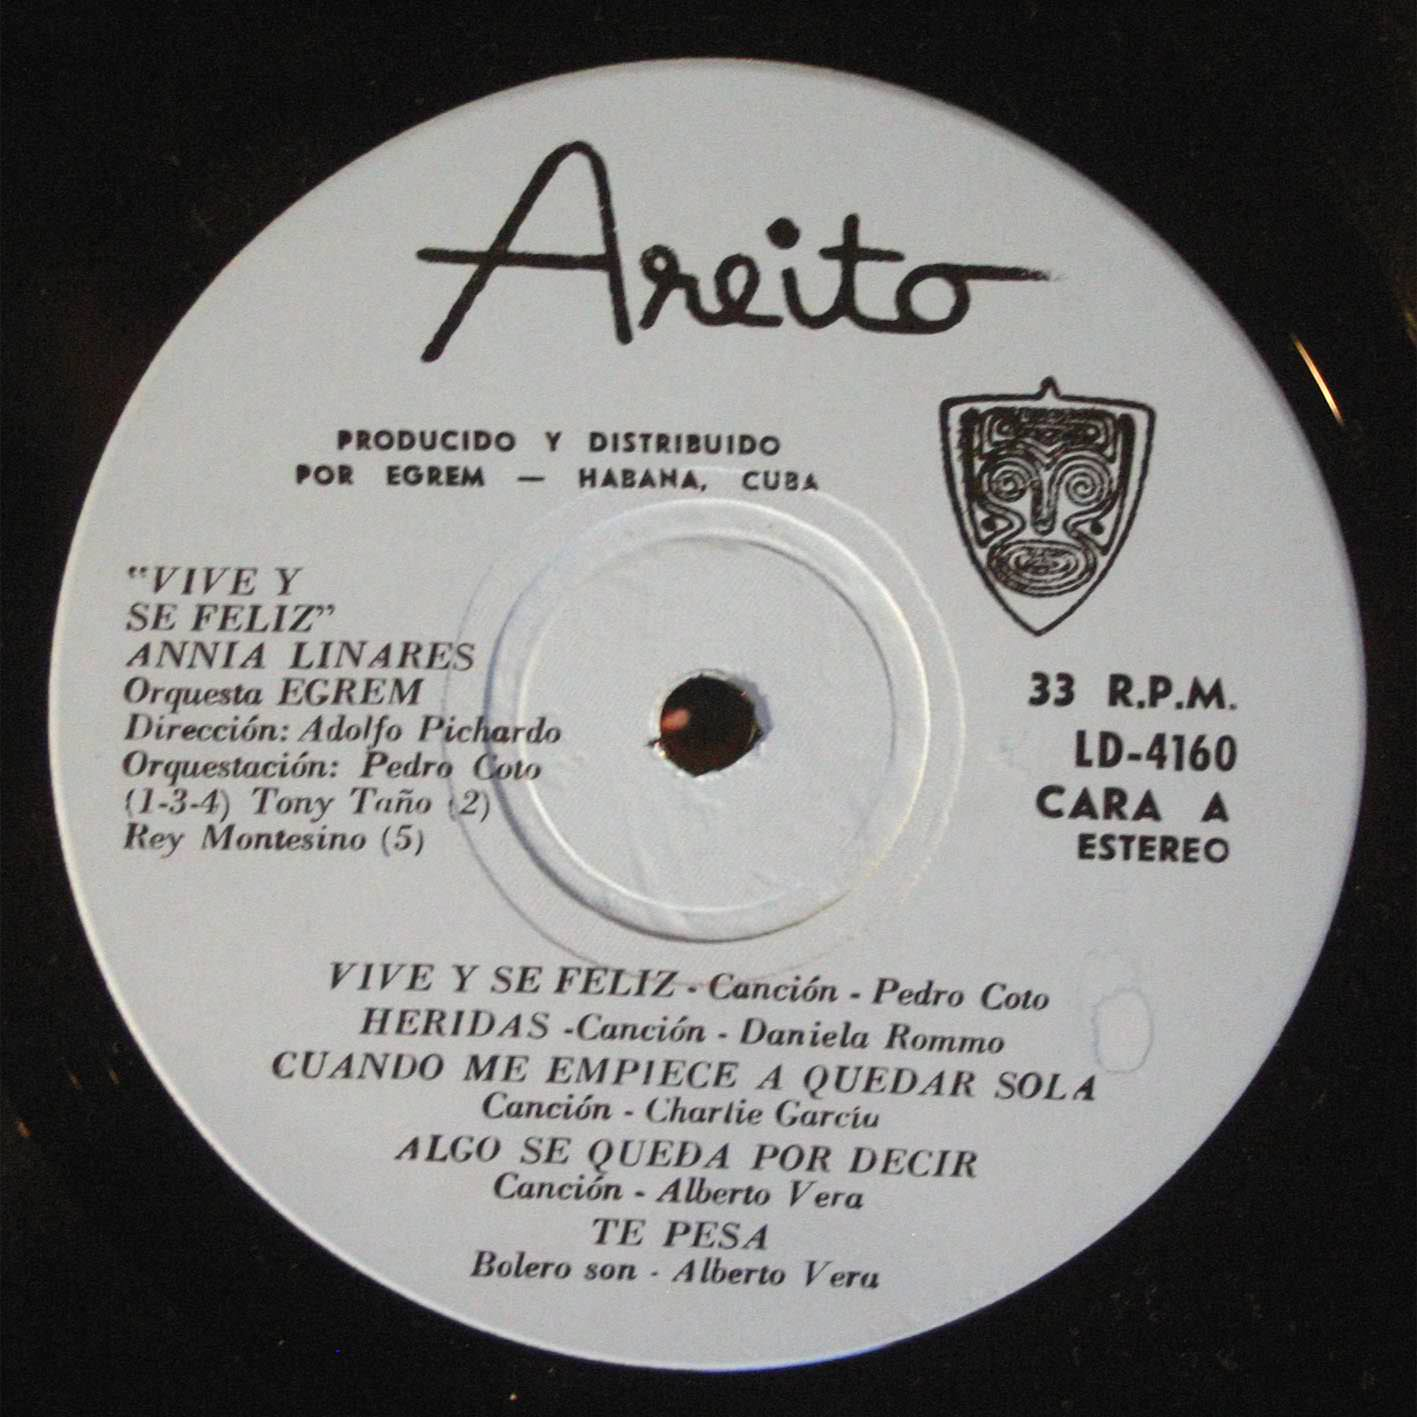 Кубинская пластинка 9, фото 3